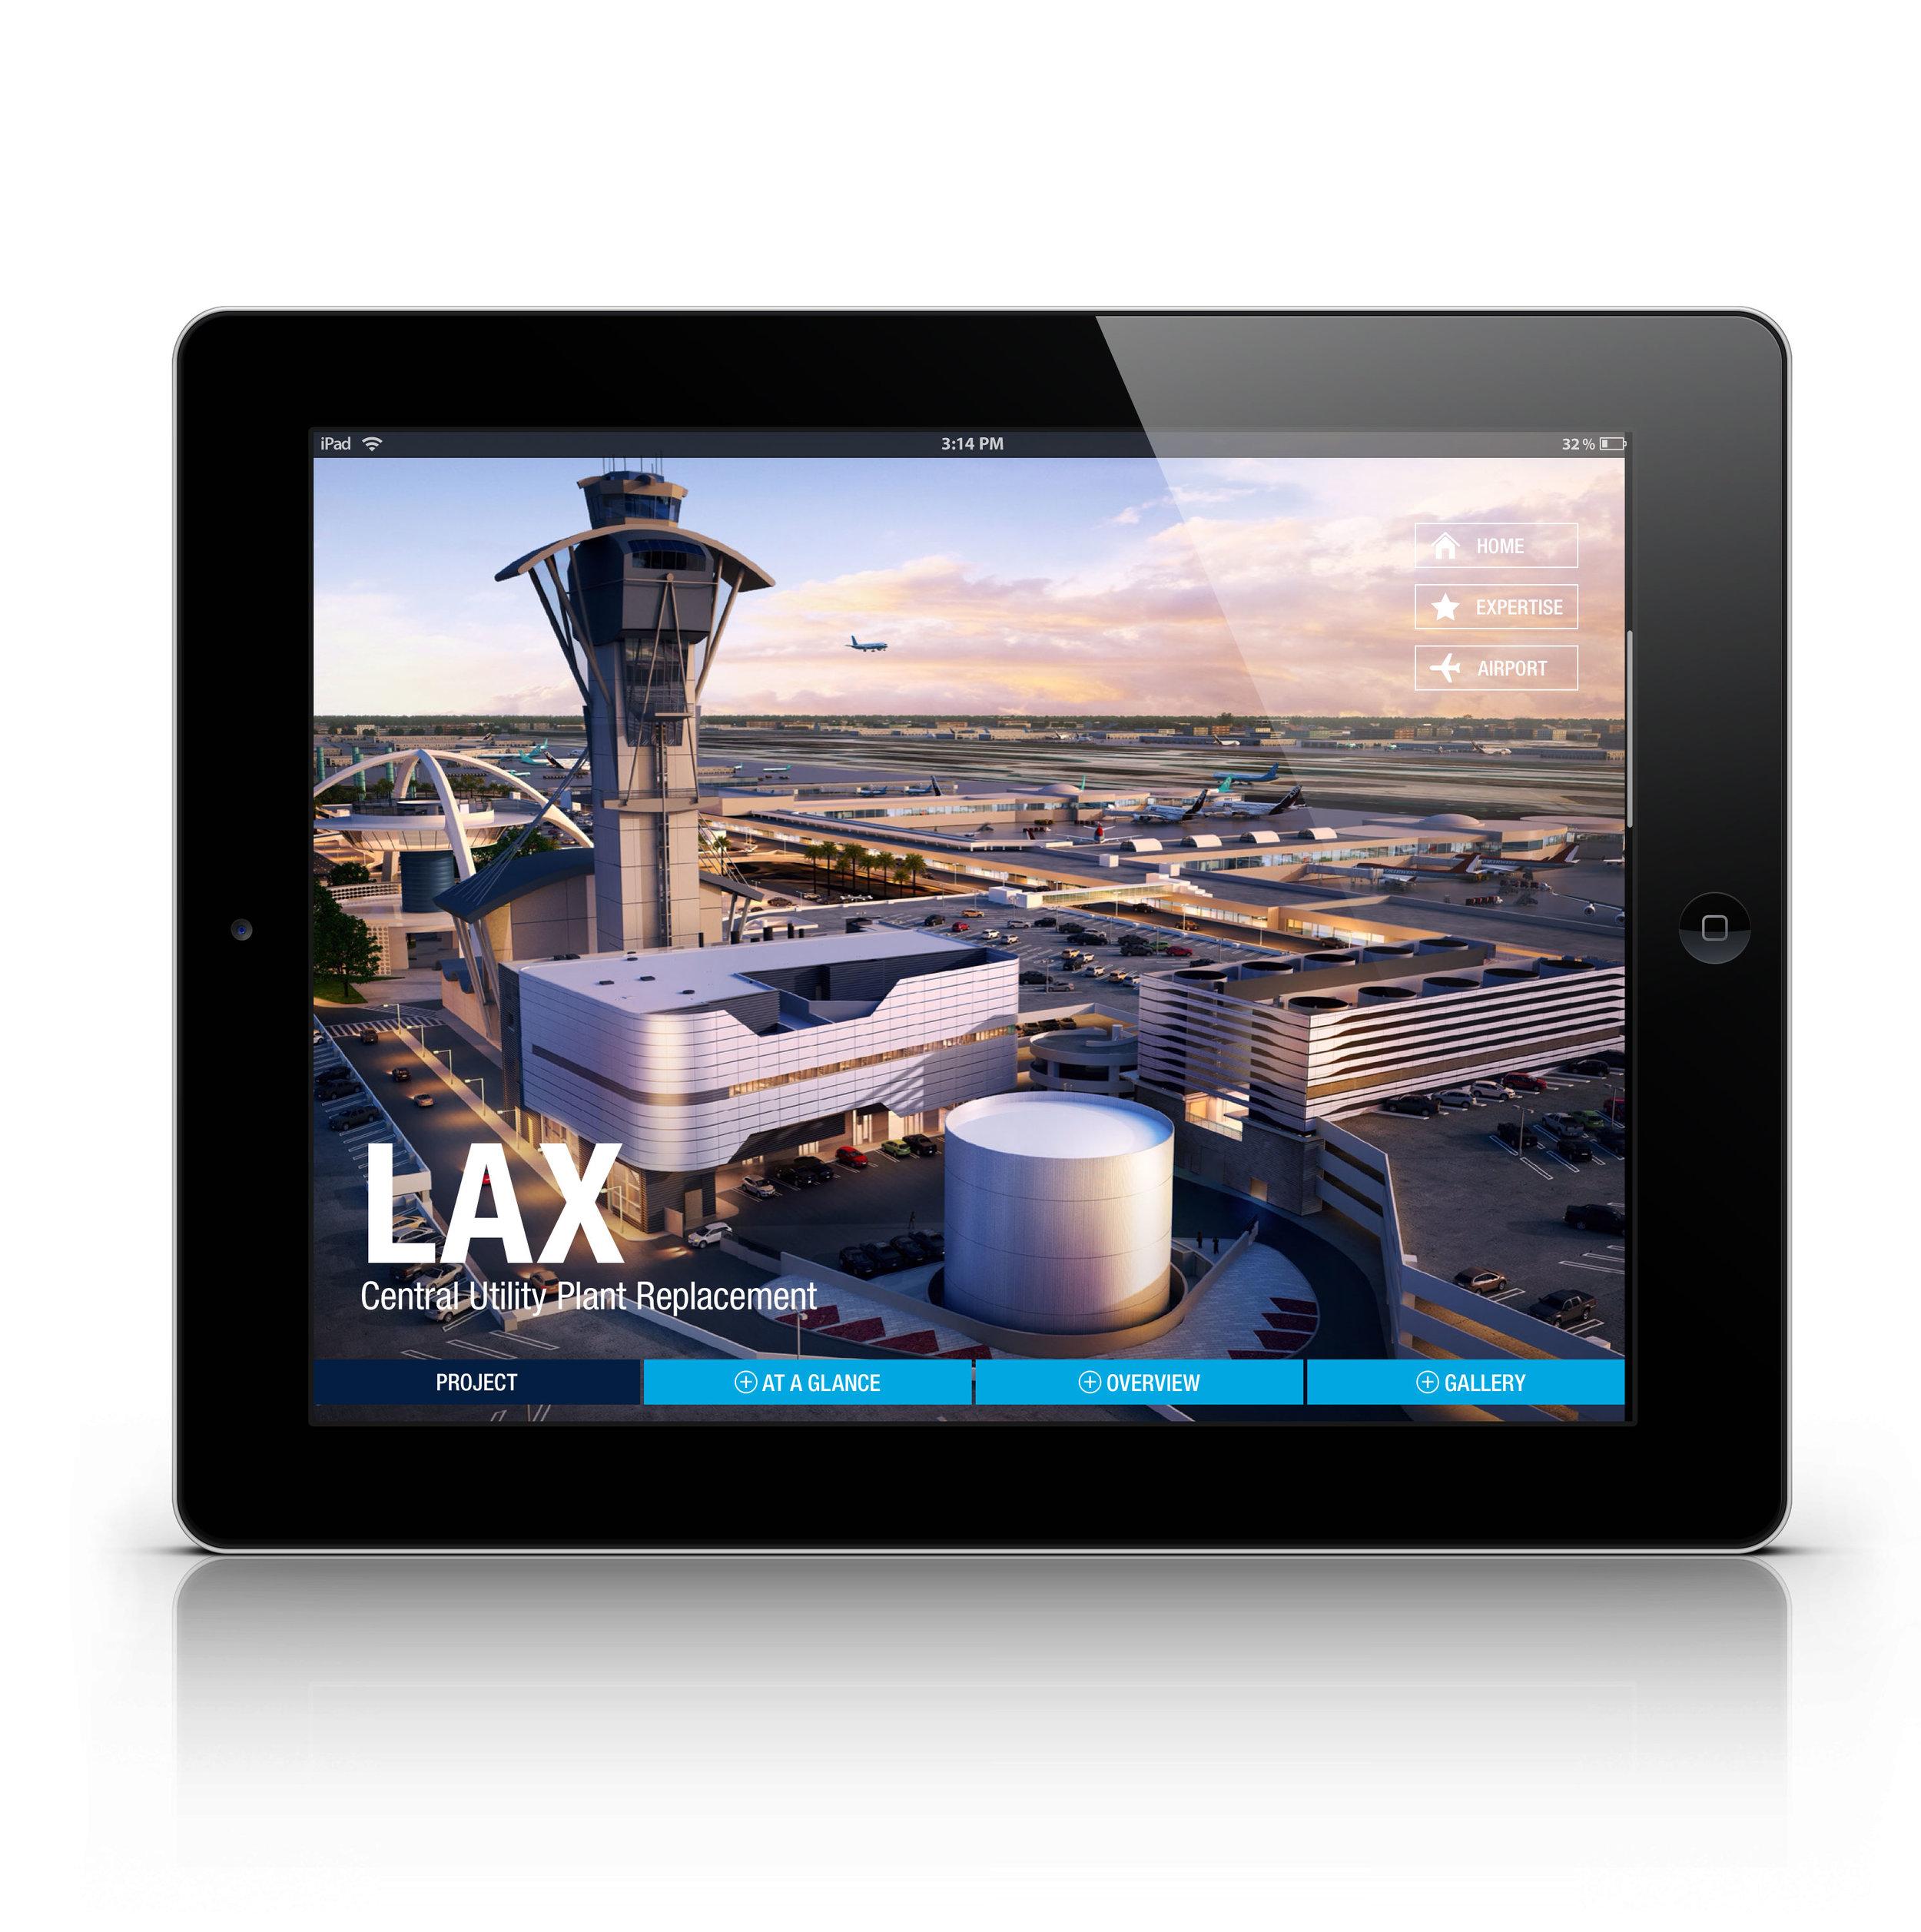 5clark-iPad-Landscape-Retina-Display-Mockup.jpg